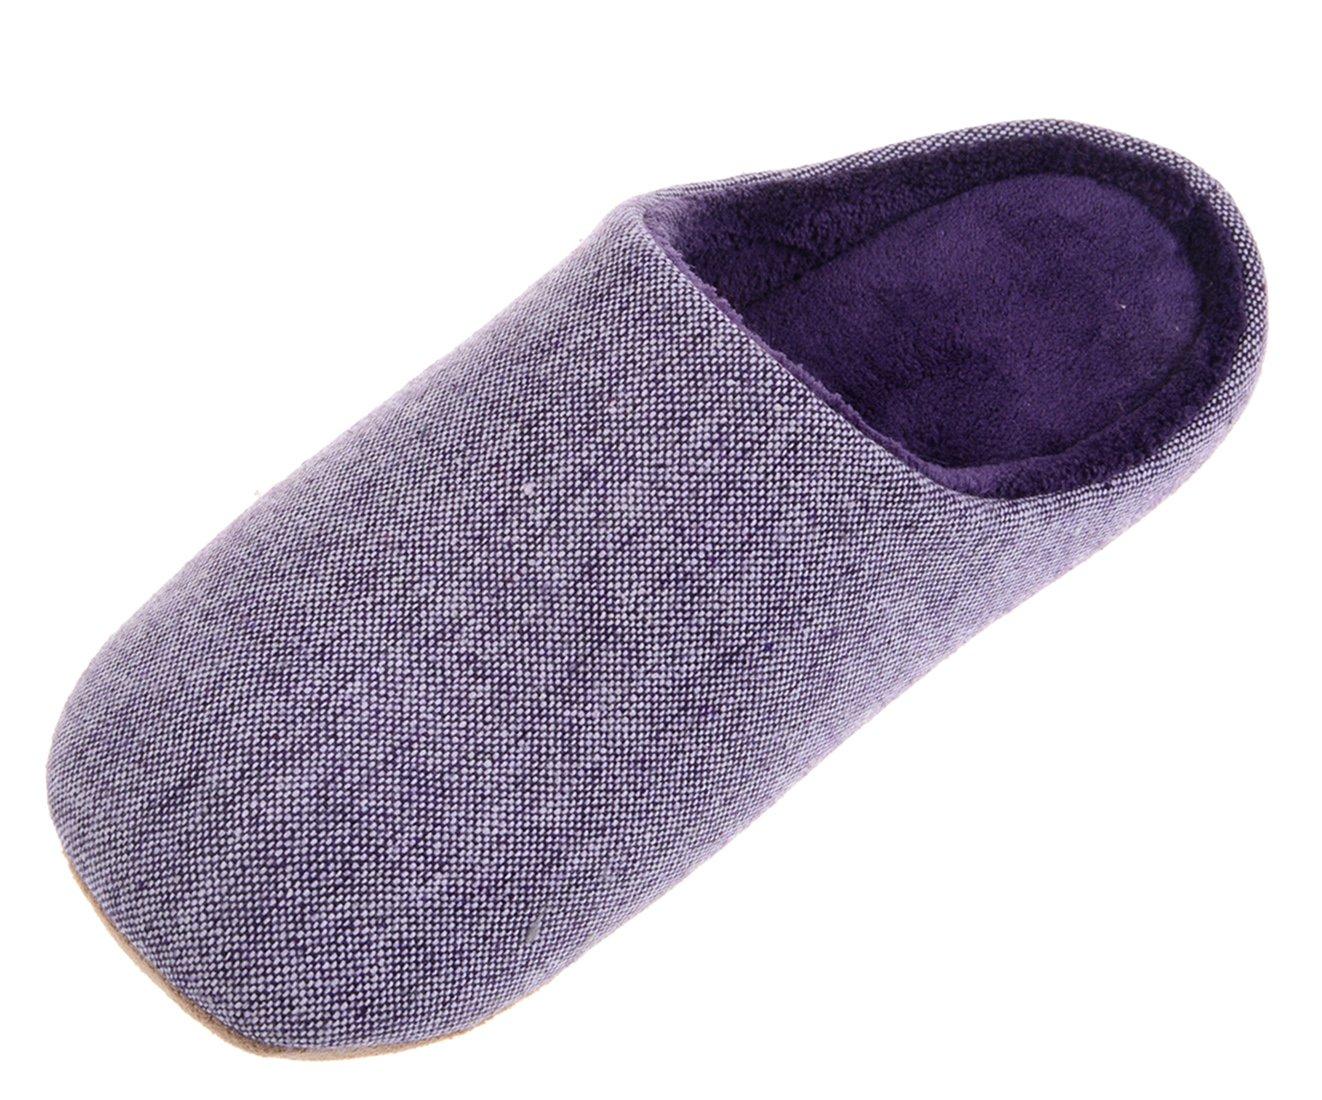 Bronze Times(TM) House Slippers,Womens Coral Fleece Memmory Foam Indoor Footwear,purple,M